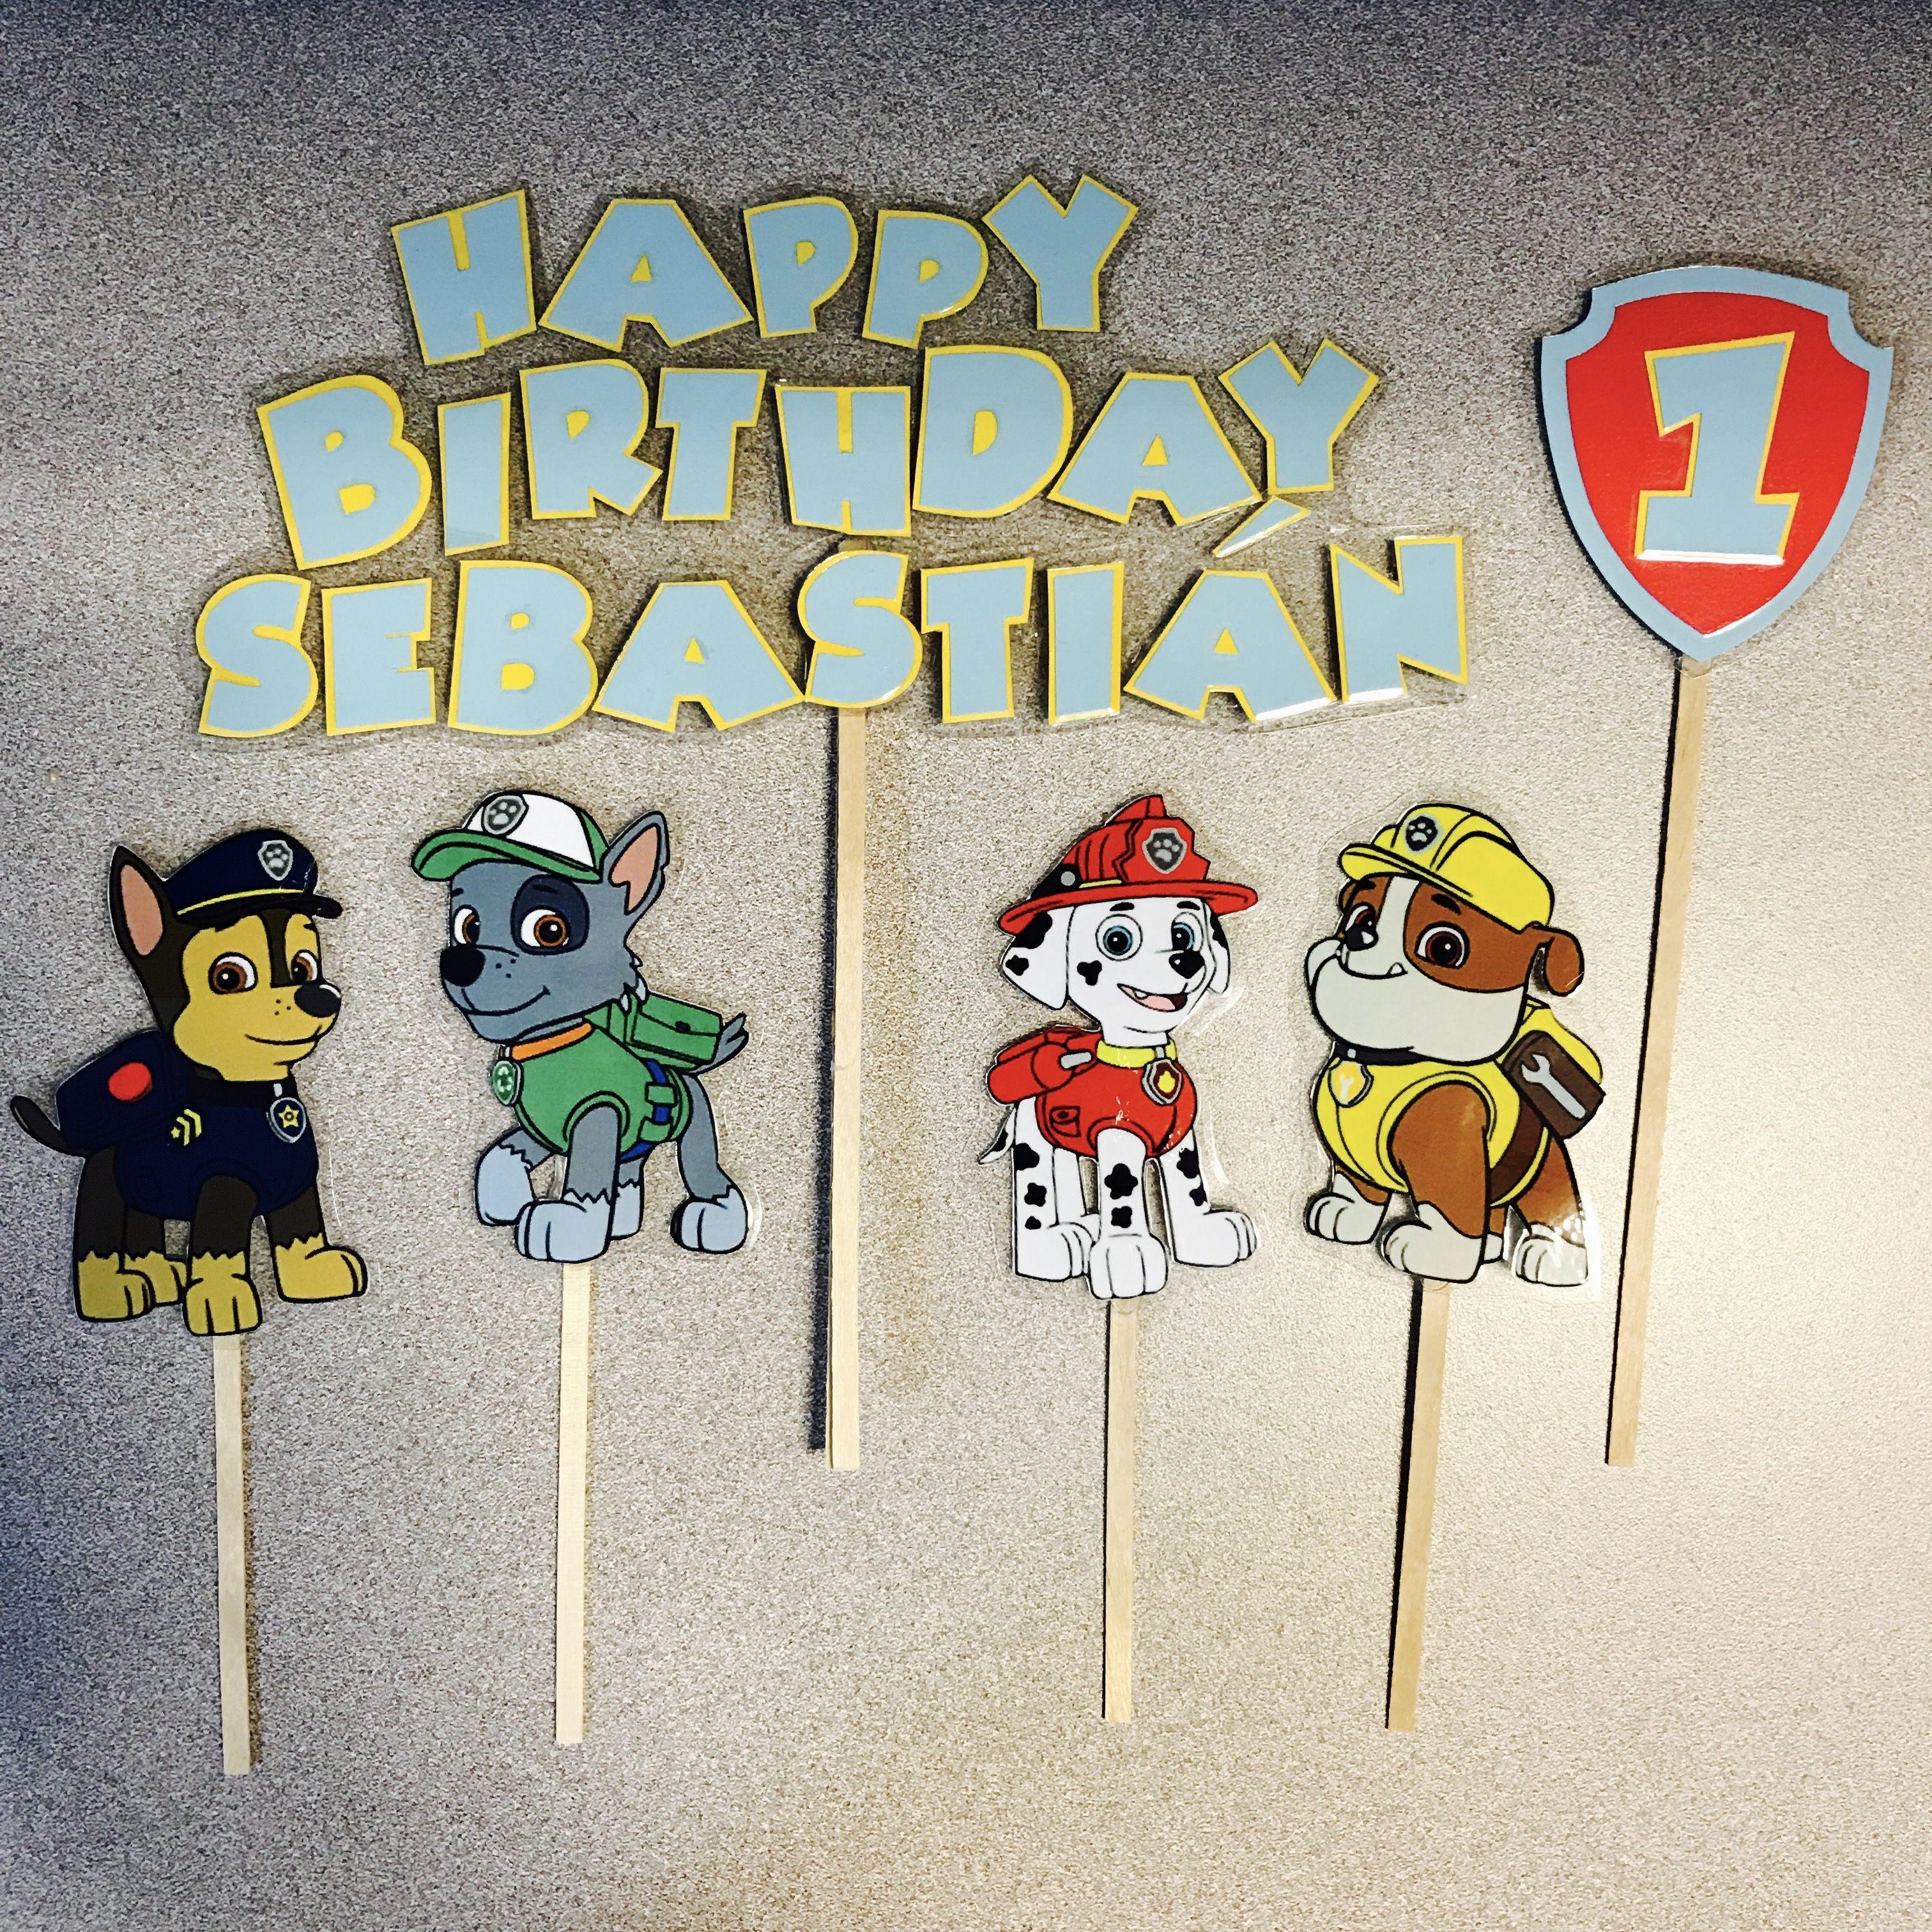 Paw patrol 1st birthday cake toppers 1st birthday cake